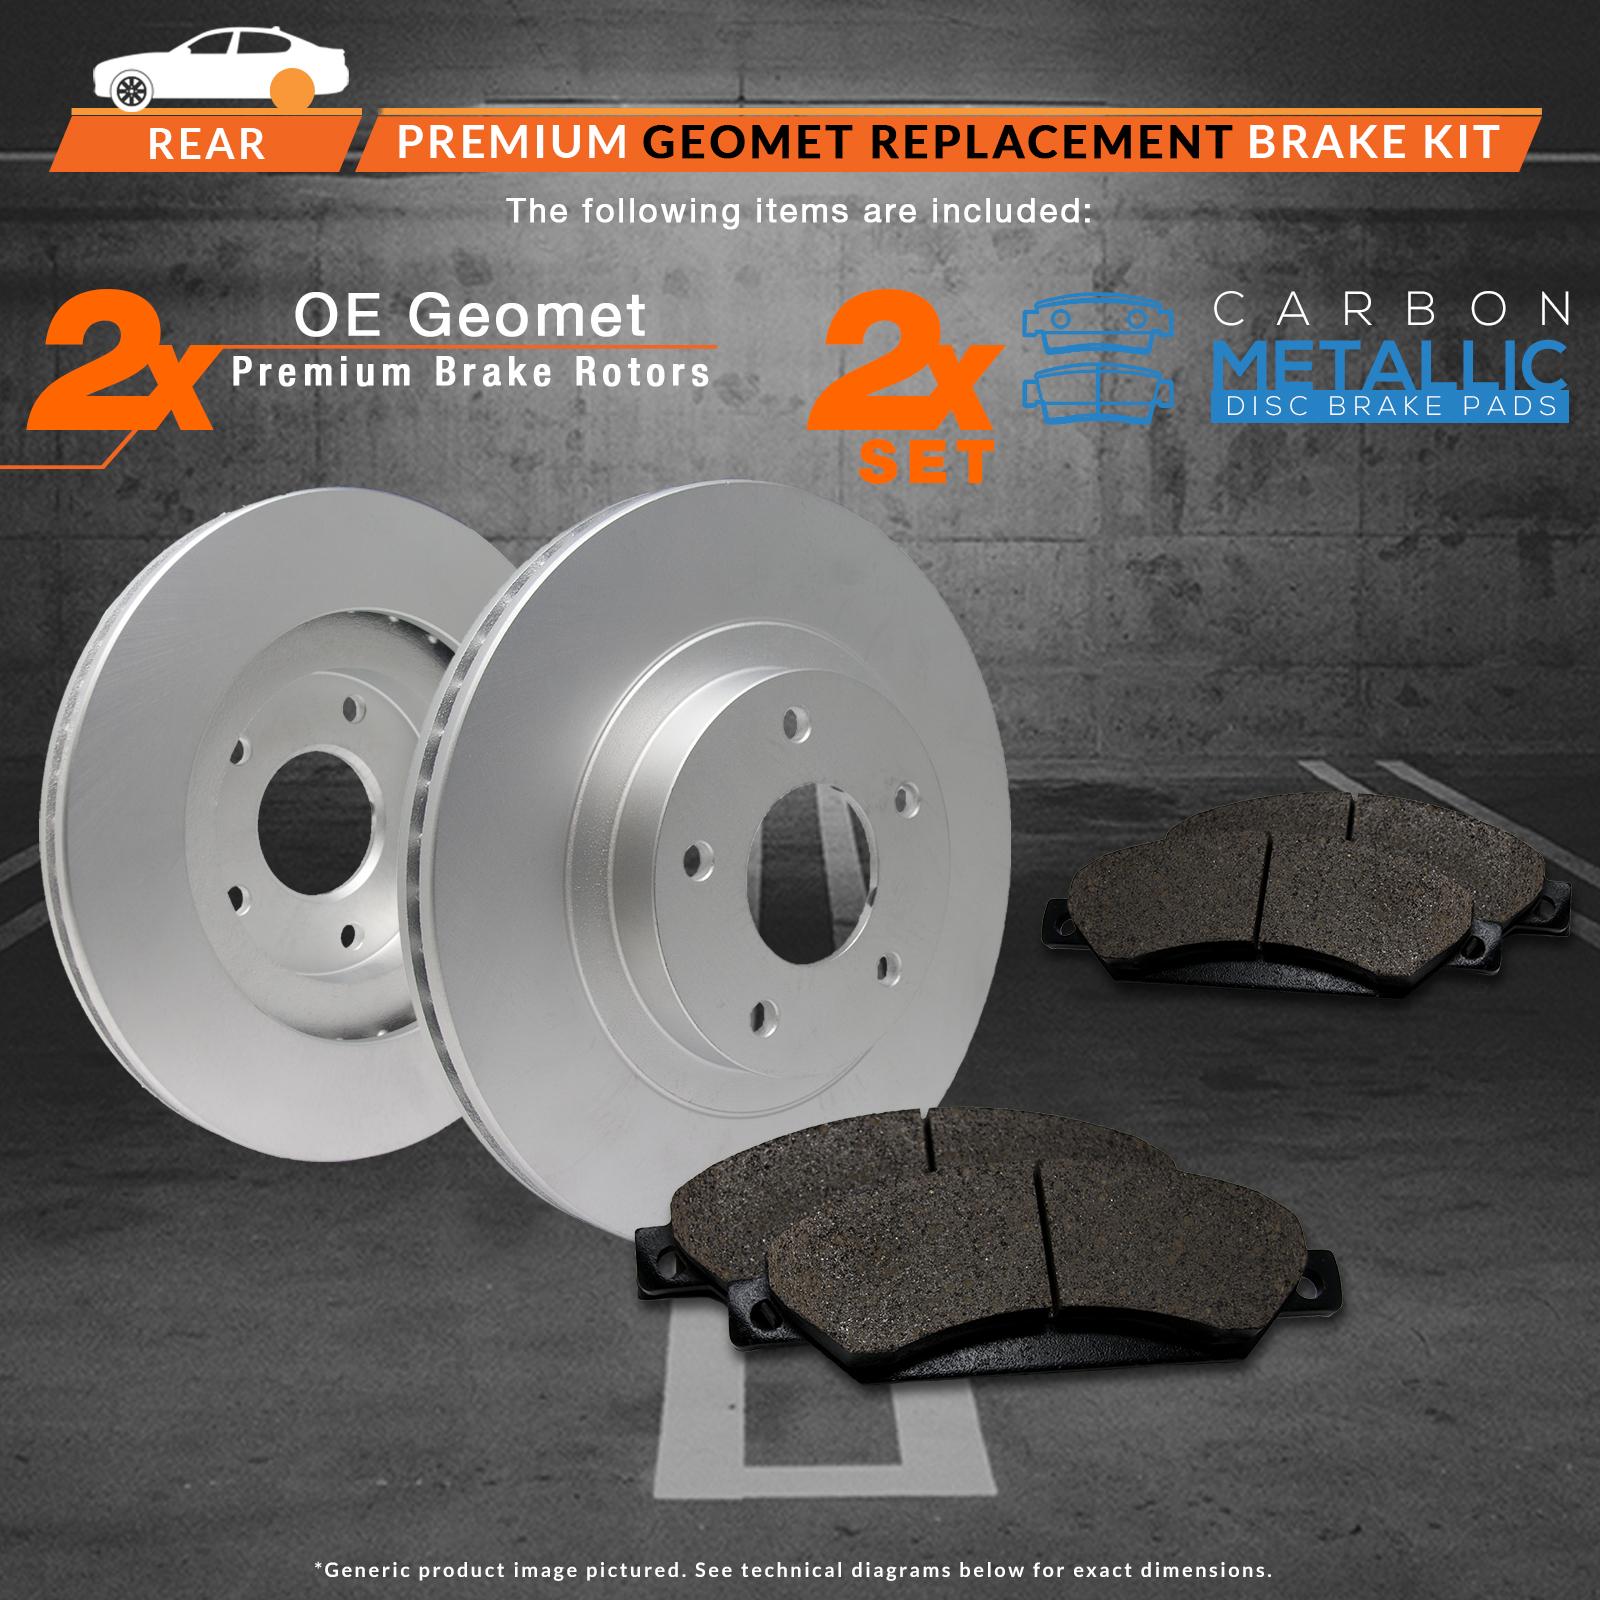 Rear-Rotors-w-Metallic-Pads-Geomet-OE-Brakes-2003-2004-2005-Vibe-Celica-Matrix thumbnail 2